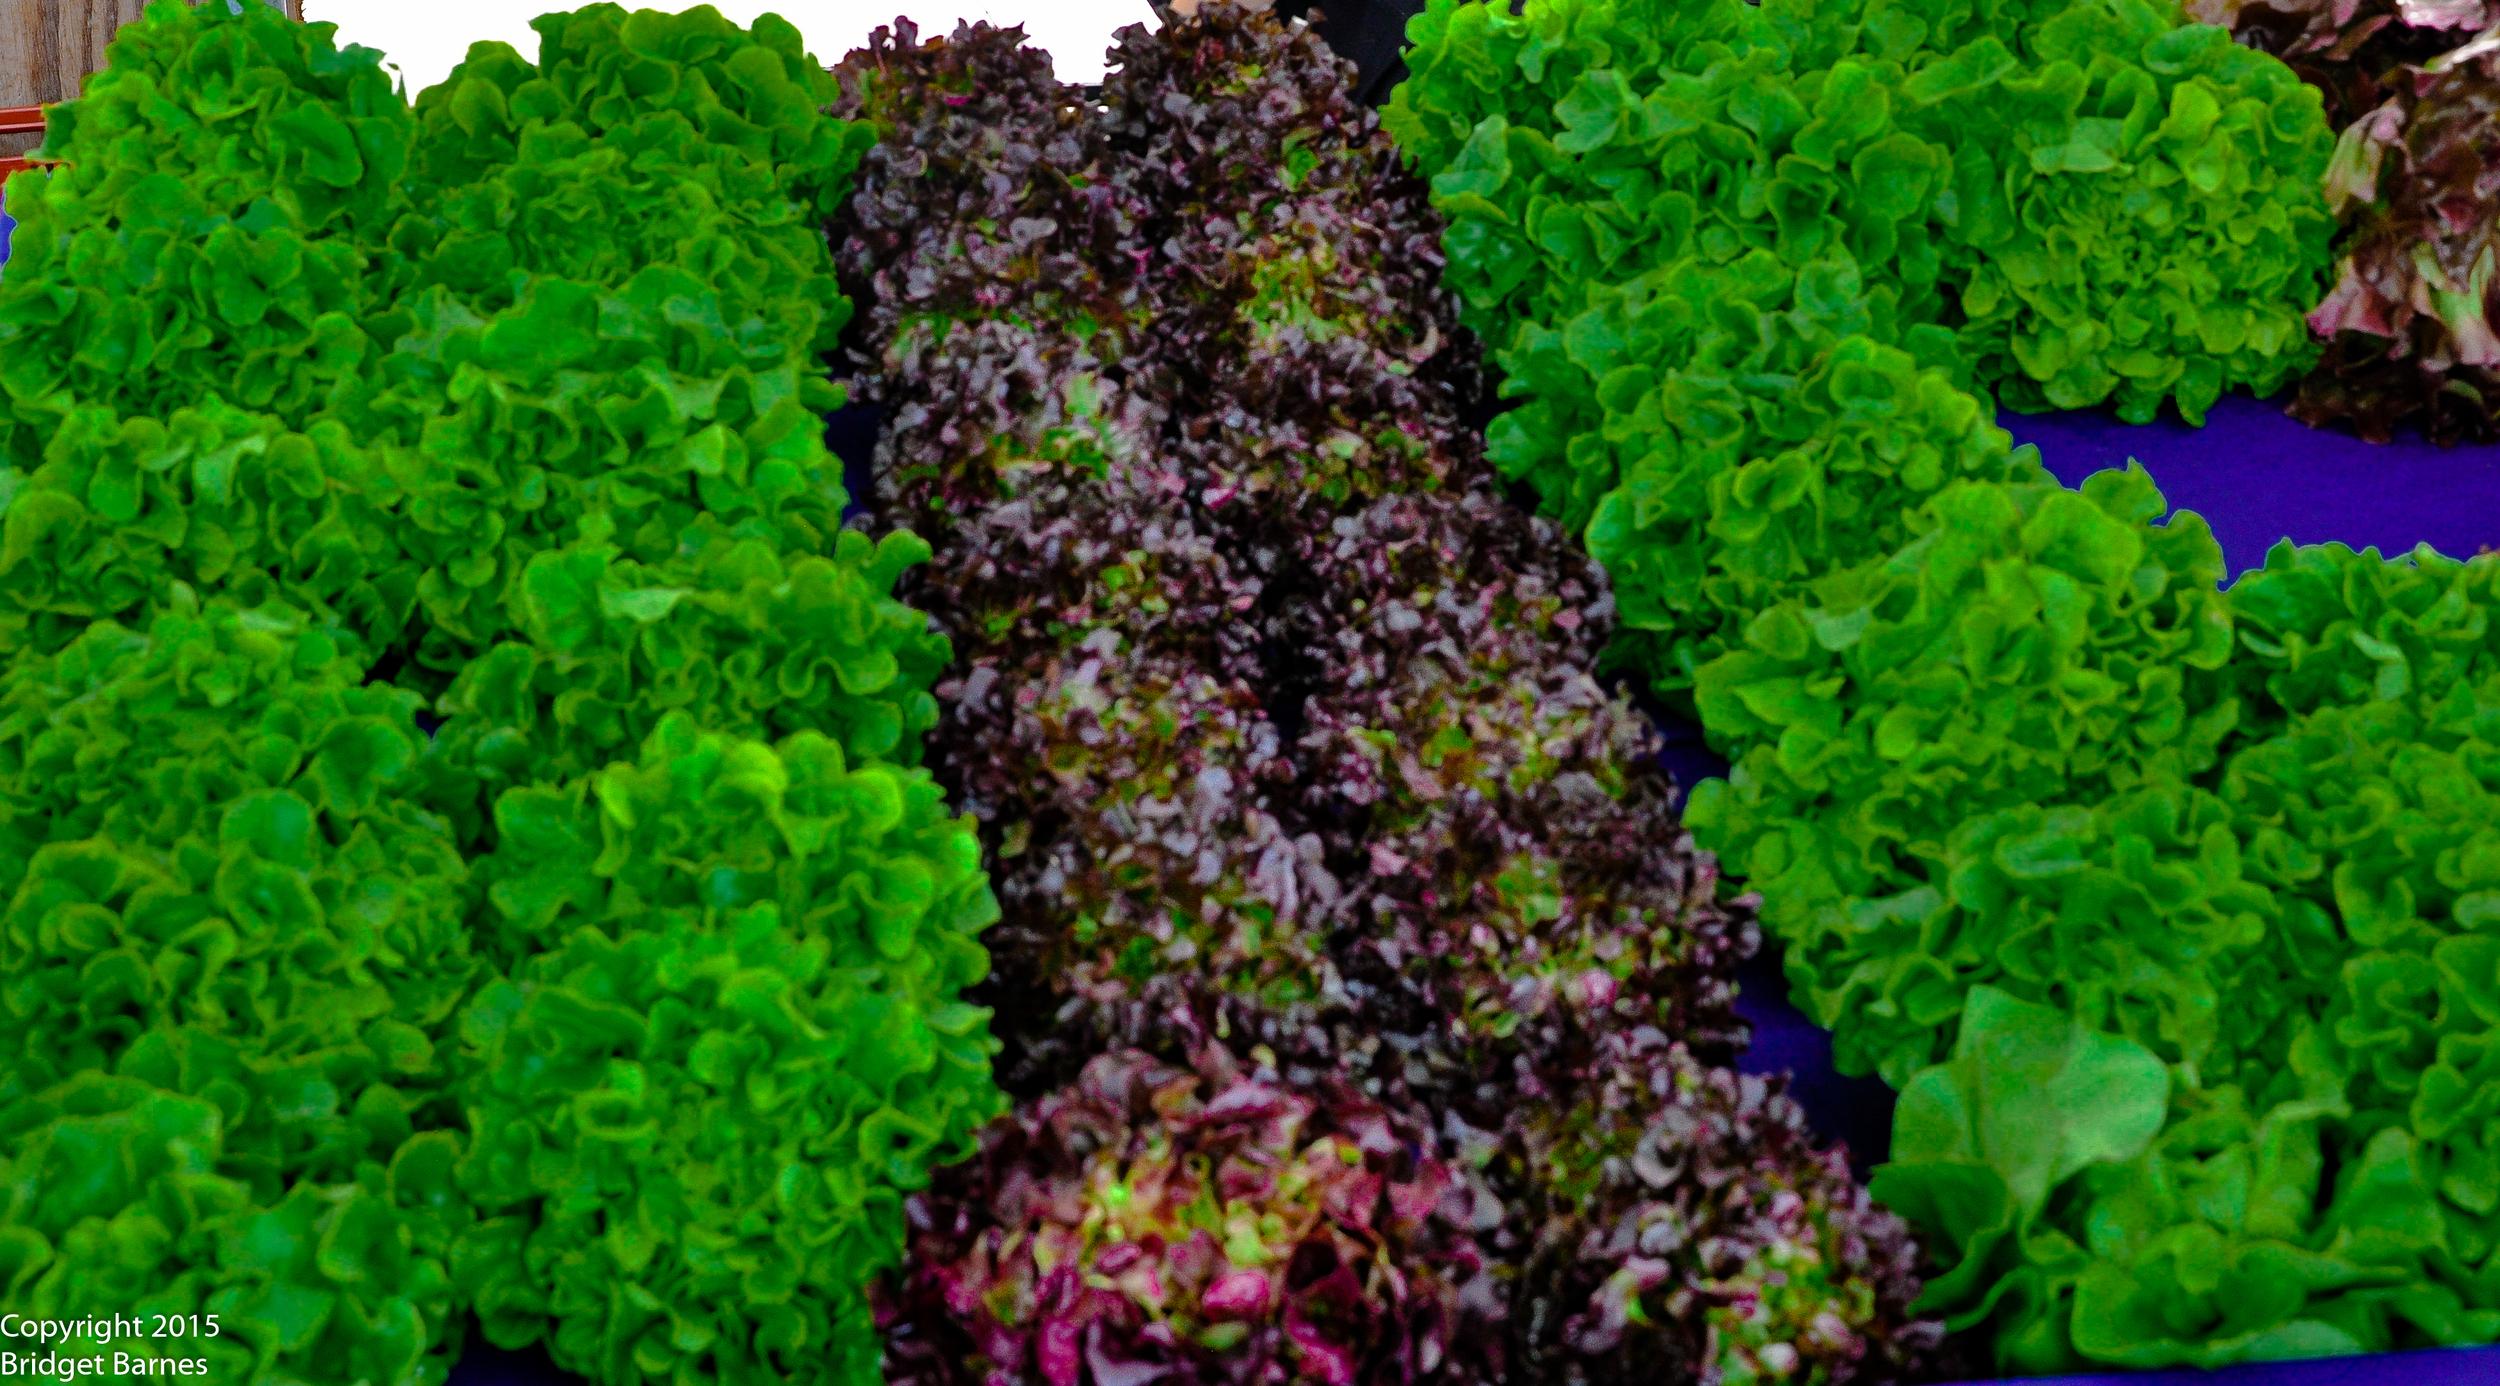 Lettuce at the Hollywood Farmers Market  ©Copyright 2015 Bridget Barnes